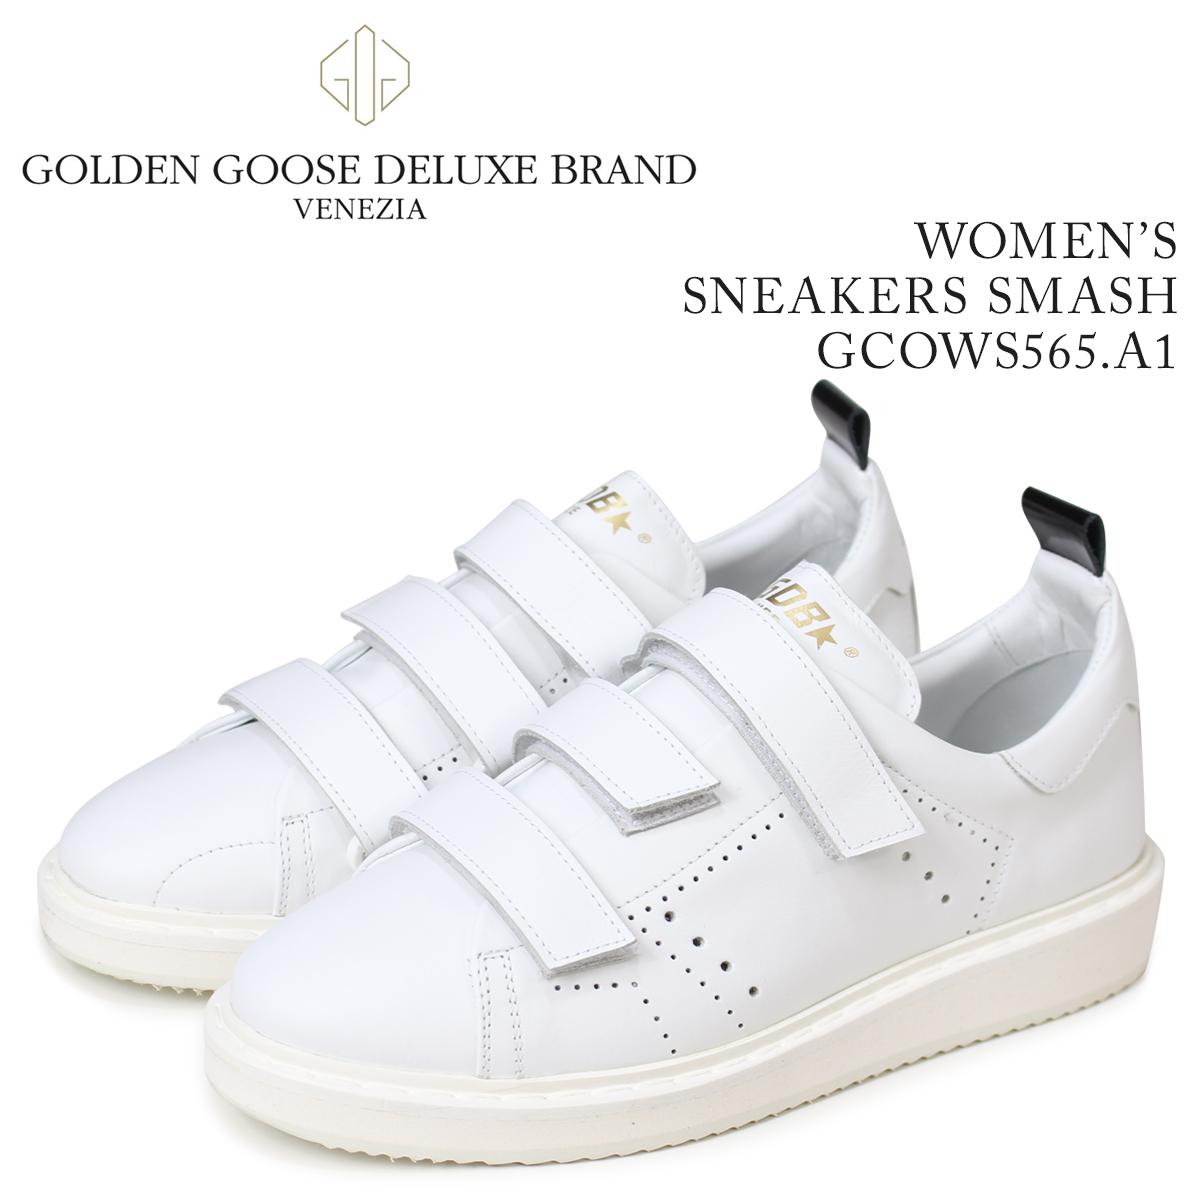 Golden Goose ゴールデングース スニーカー レディース スニーカーズ スマッシュ SNEAKERS SMASH ホワイト 白 GCOWS565 A1